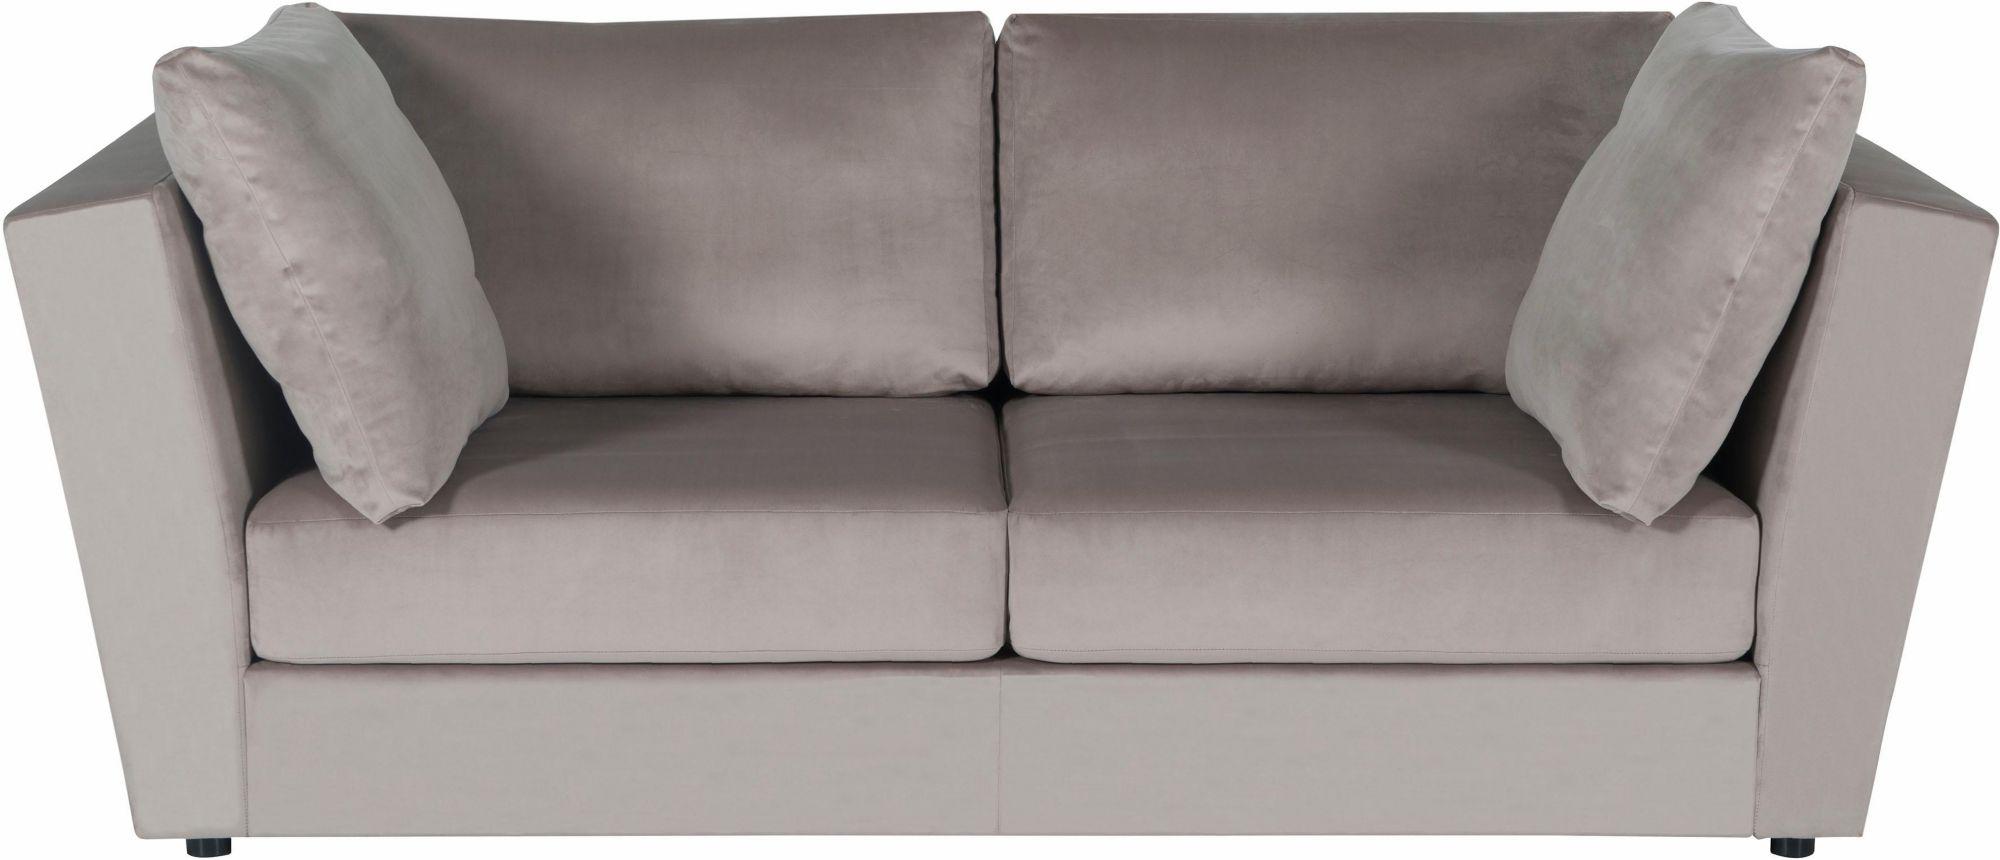 ALTE GERBEREI Alte Gerberei 2-Sitzer Sofa »Pristin« inklusive Armlehnkissen